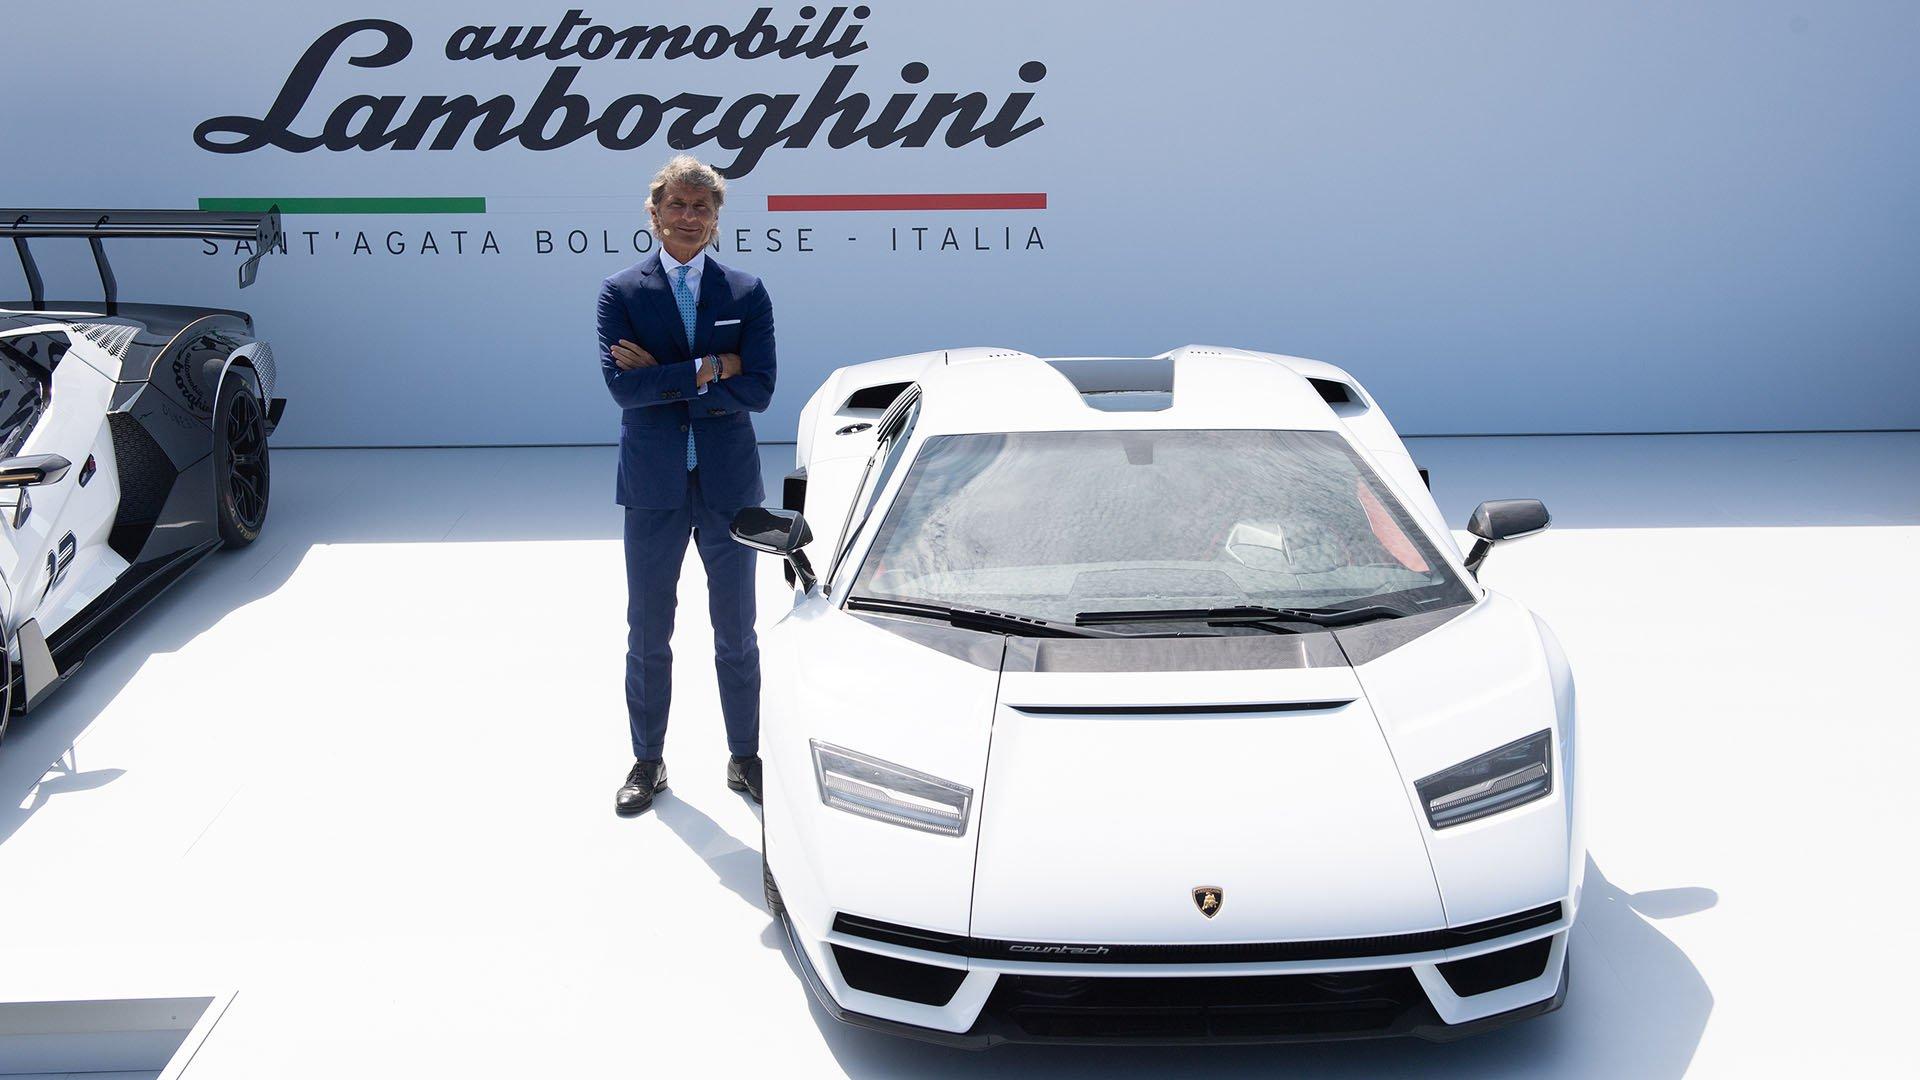 Presenter standing next to Lamborghini Countach LPI 800-4